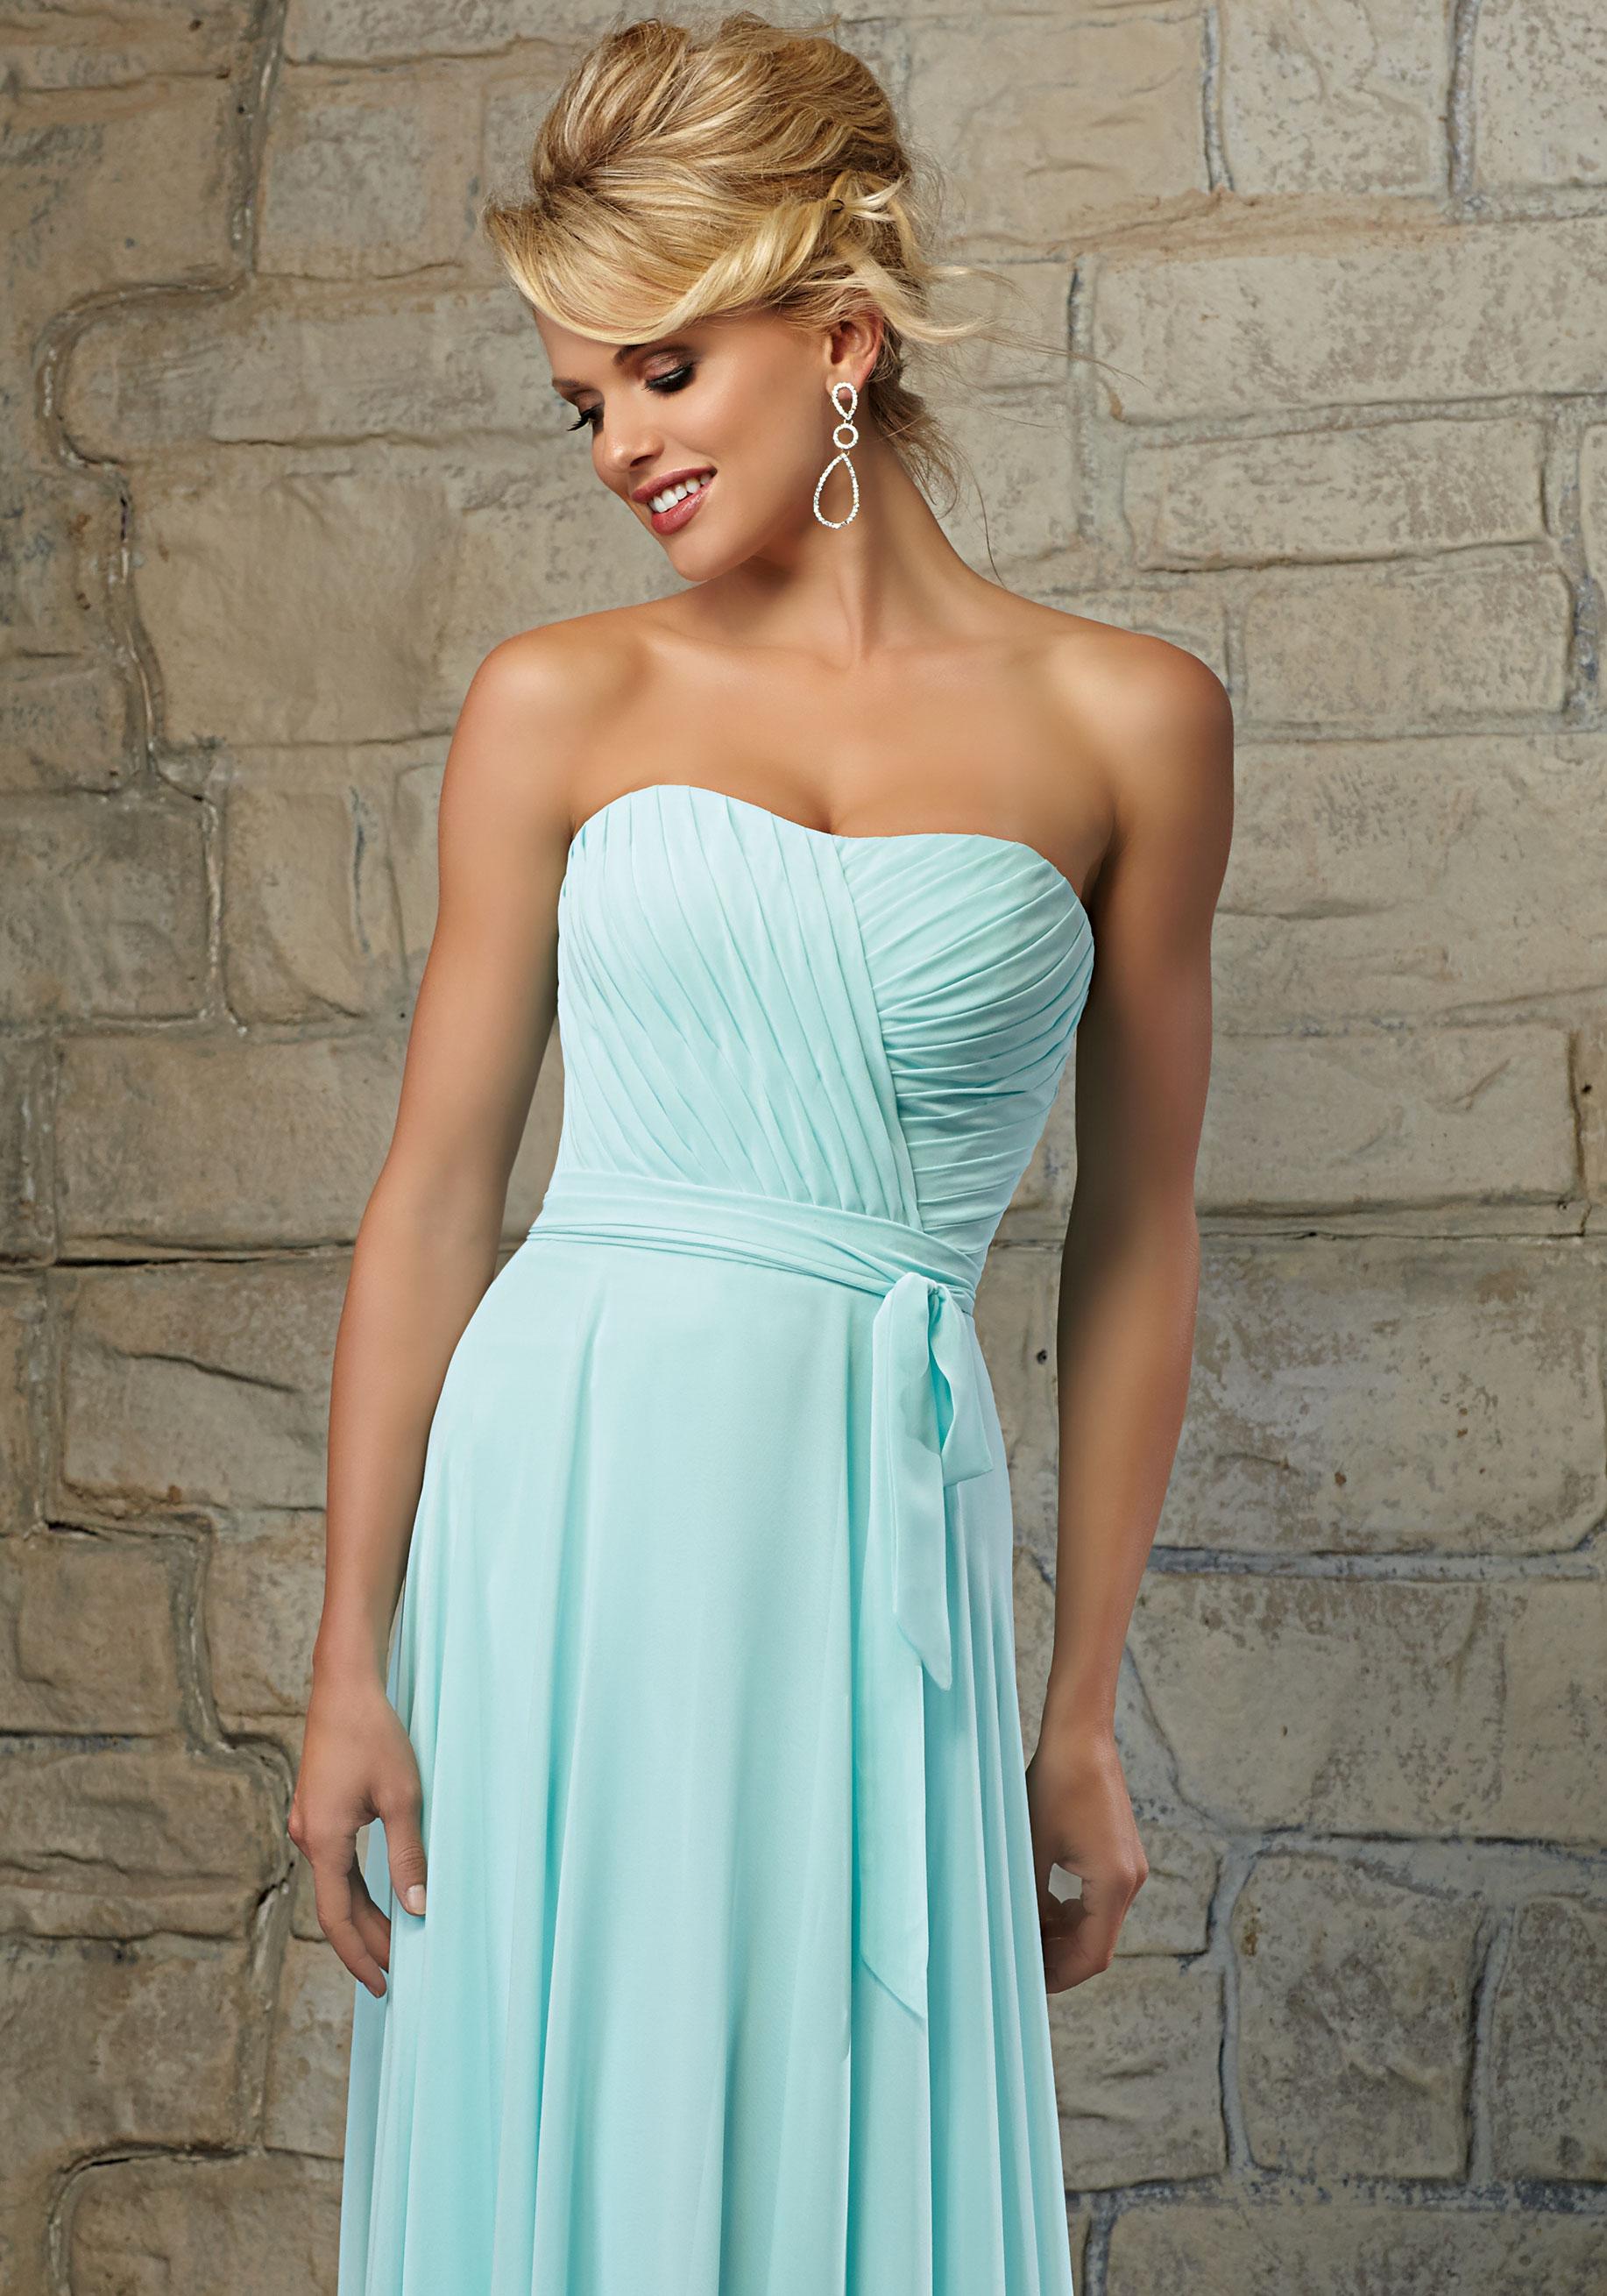 evening belts for dresses photo - 1